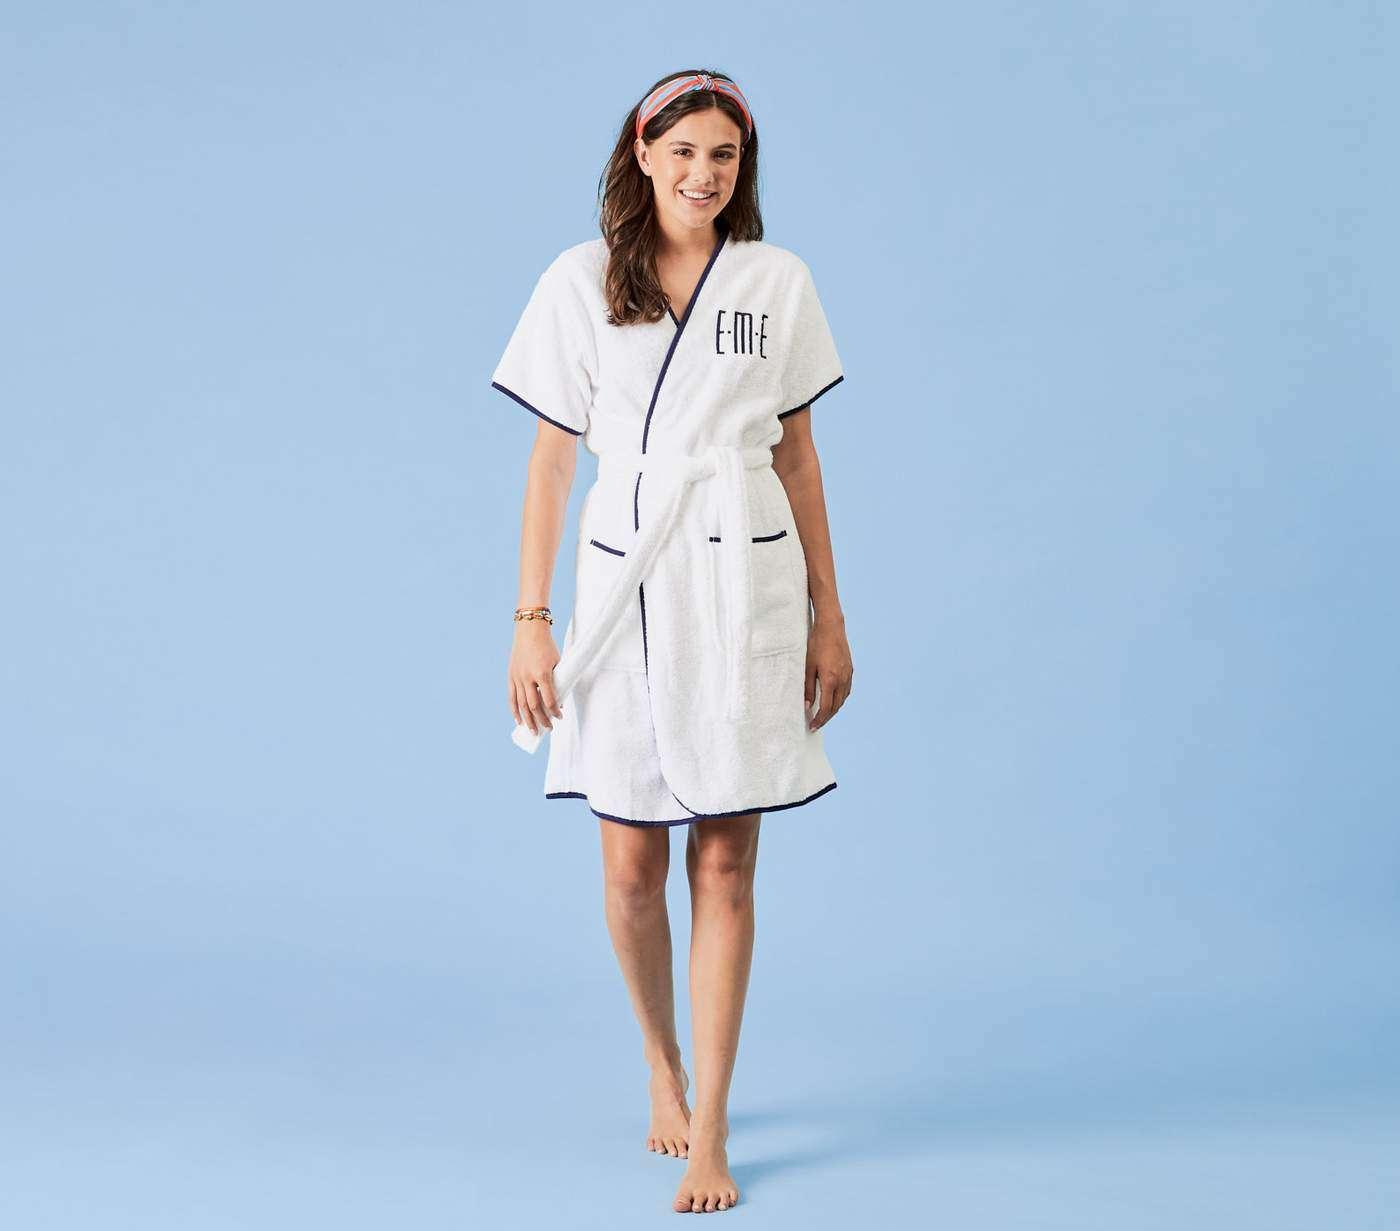 The #1 Bathrobe this Holiday Season: Weezie Towels Bathrobe